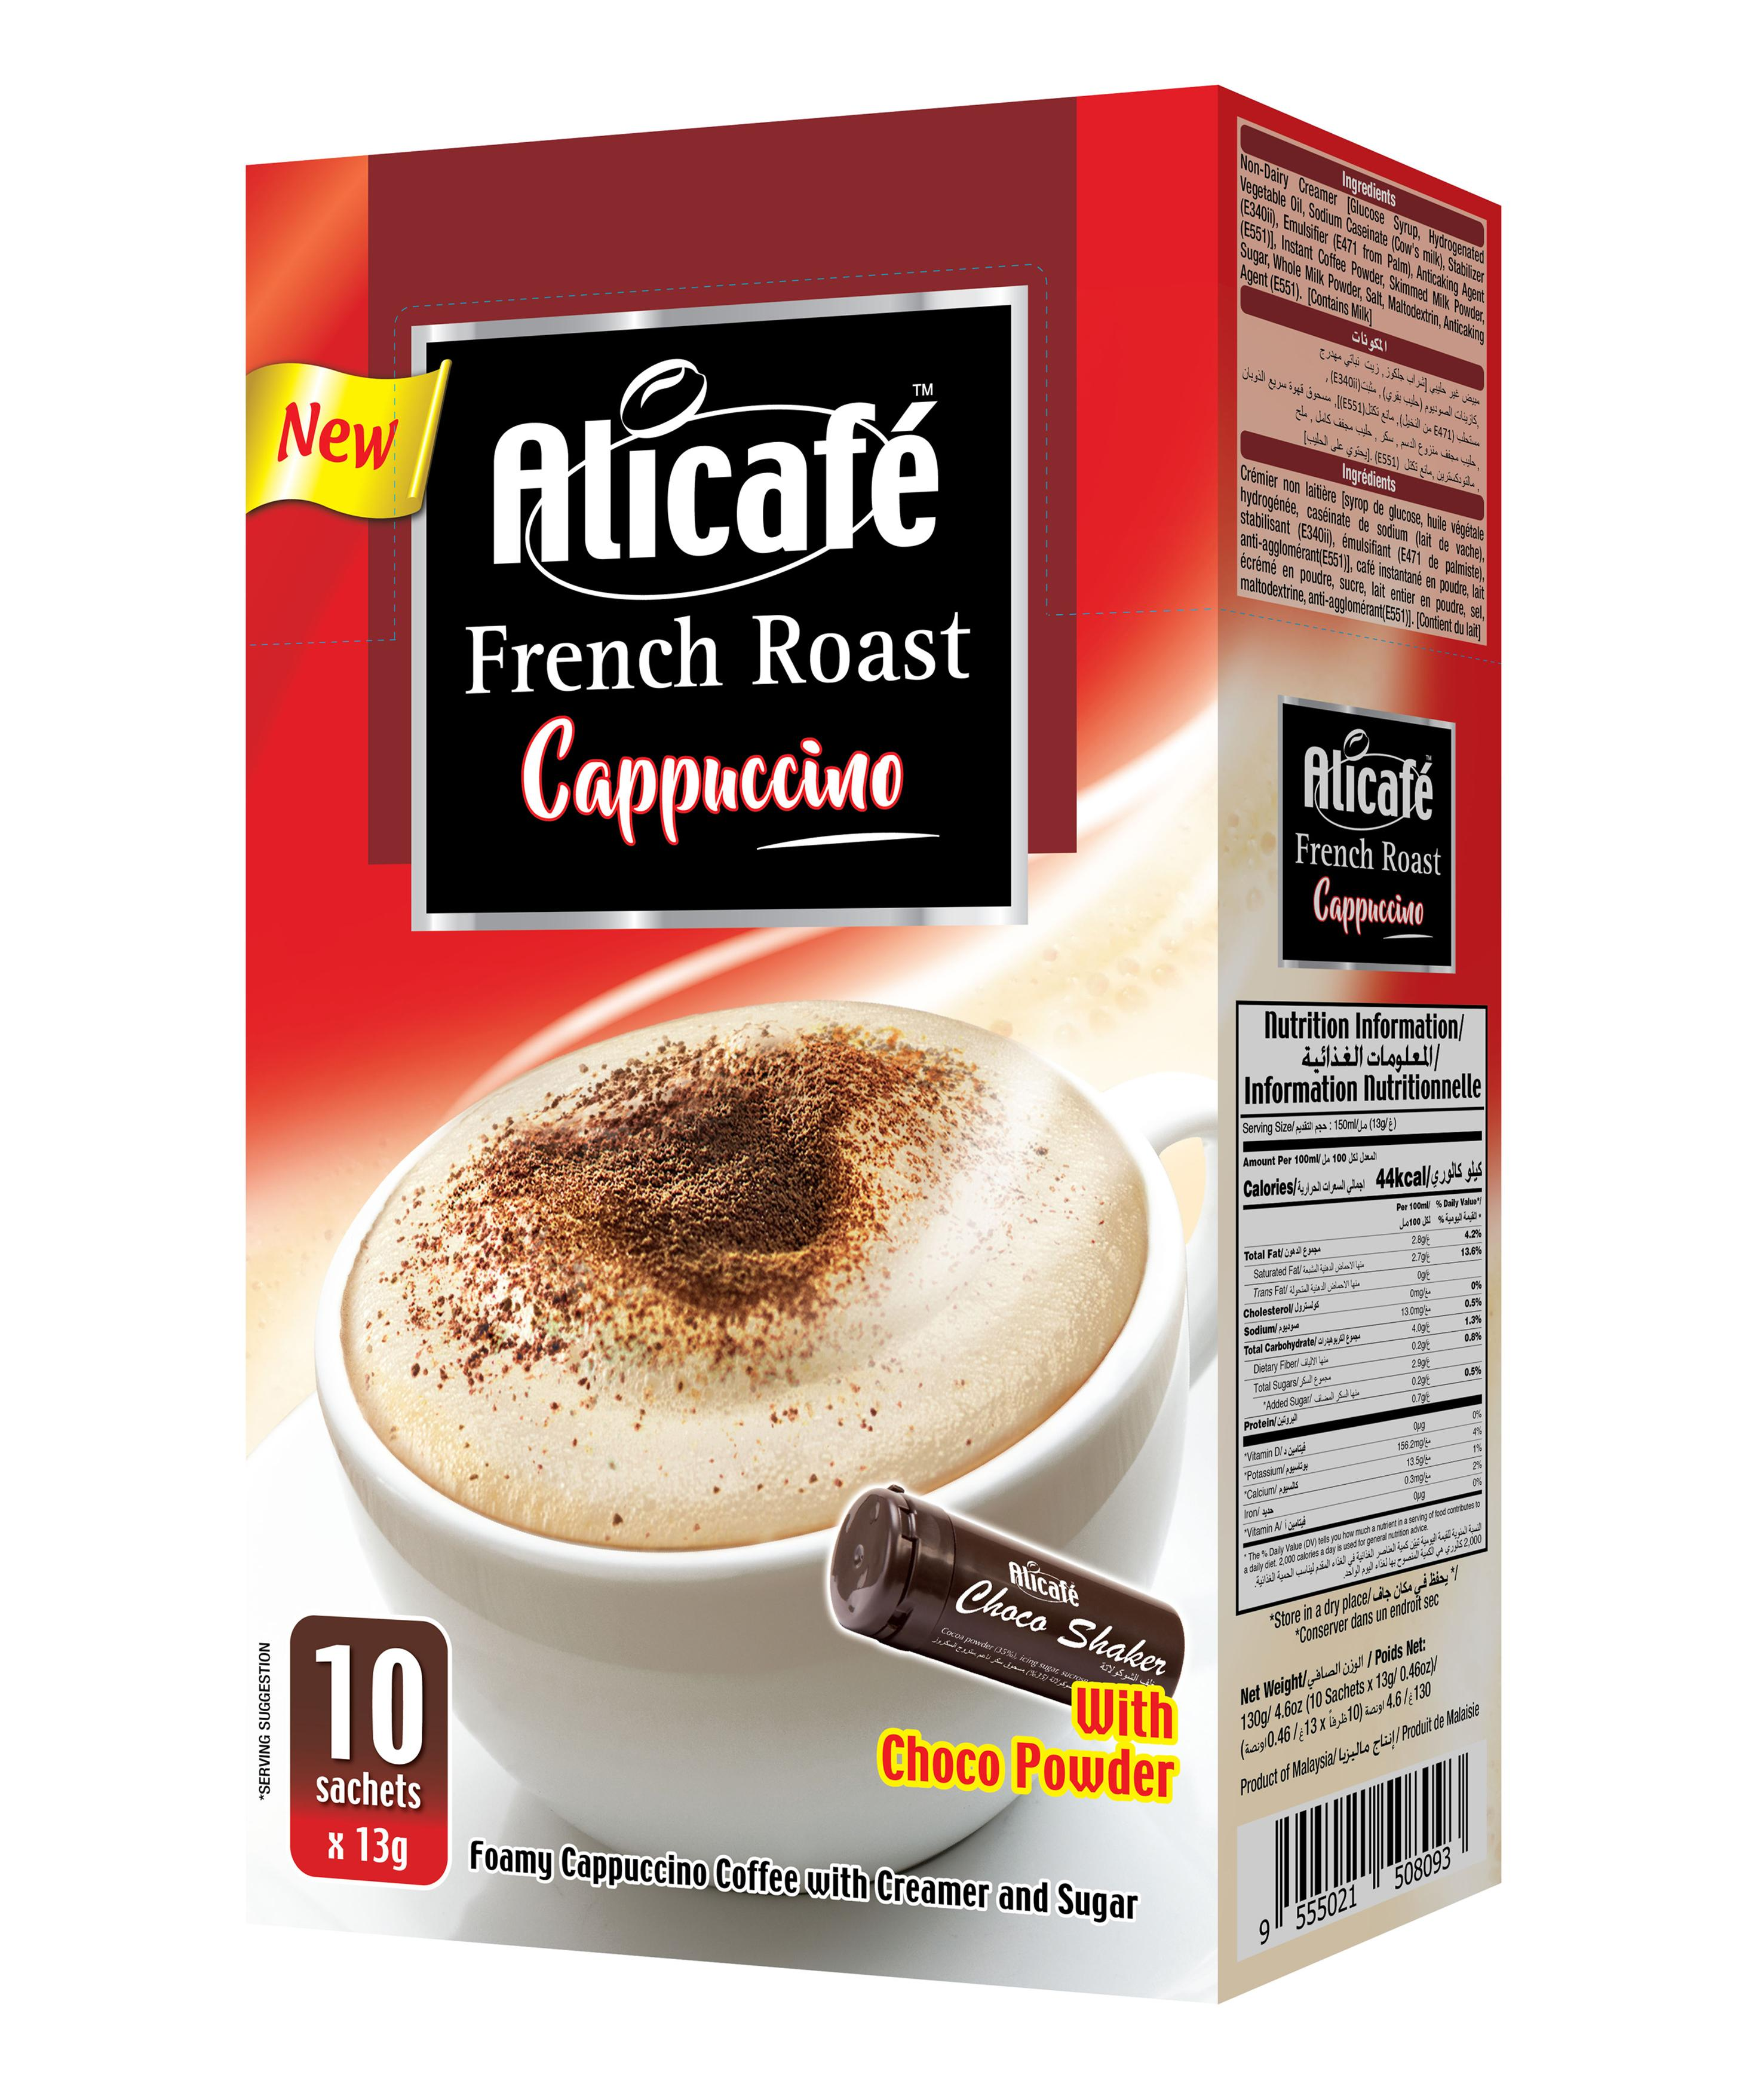 Alicafé French Roast Cappuccino